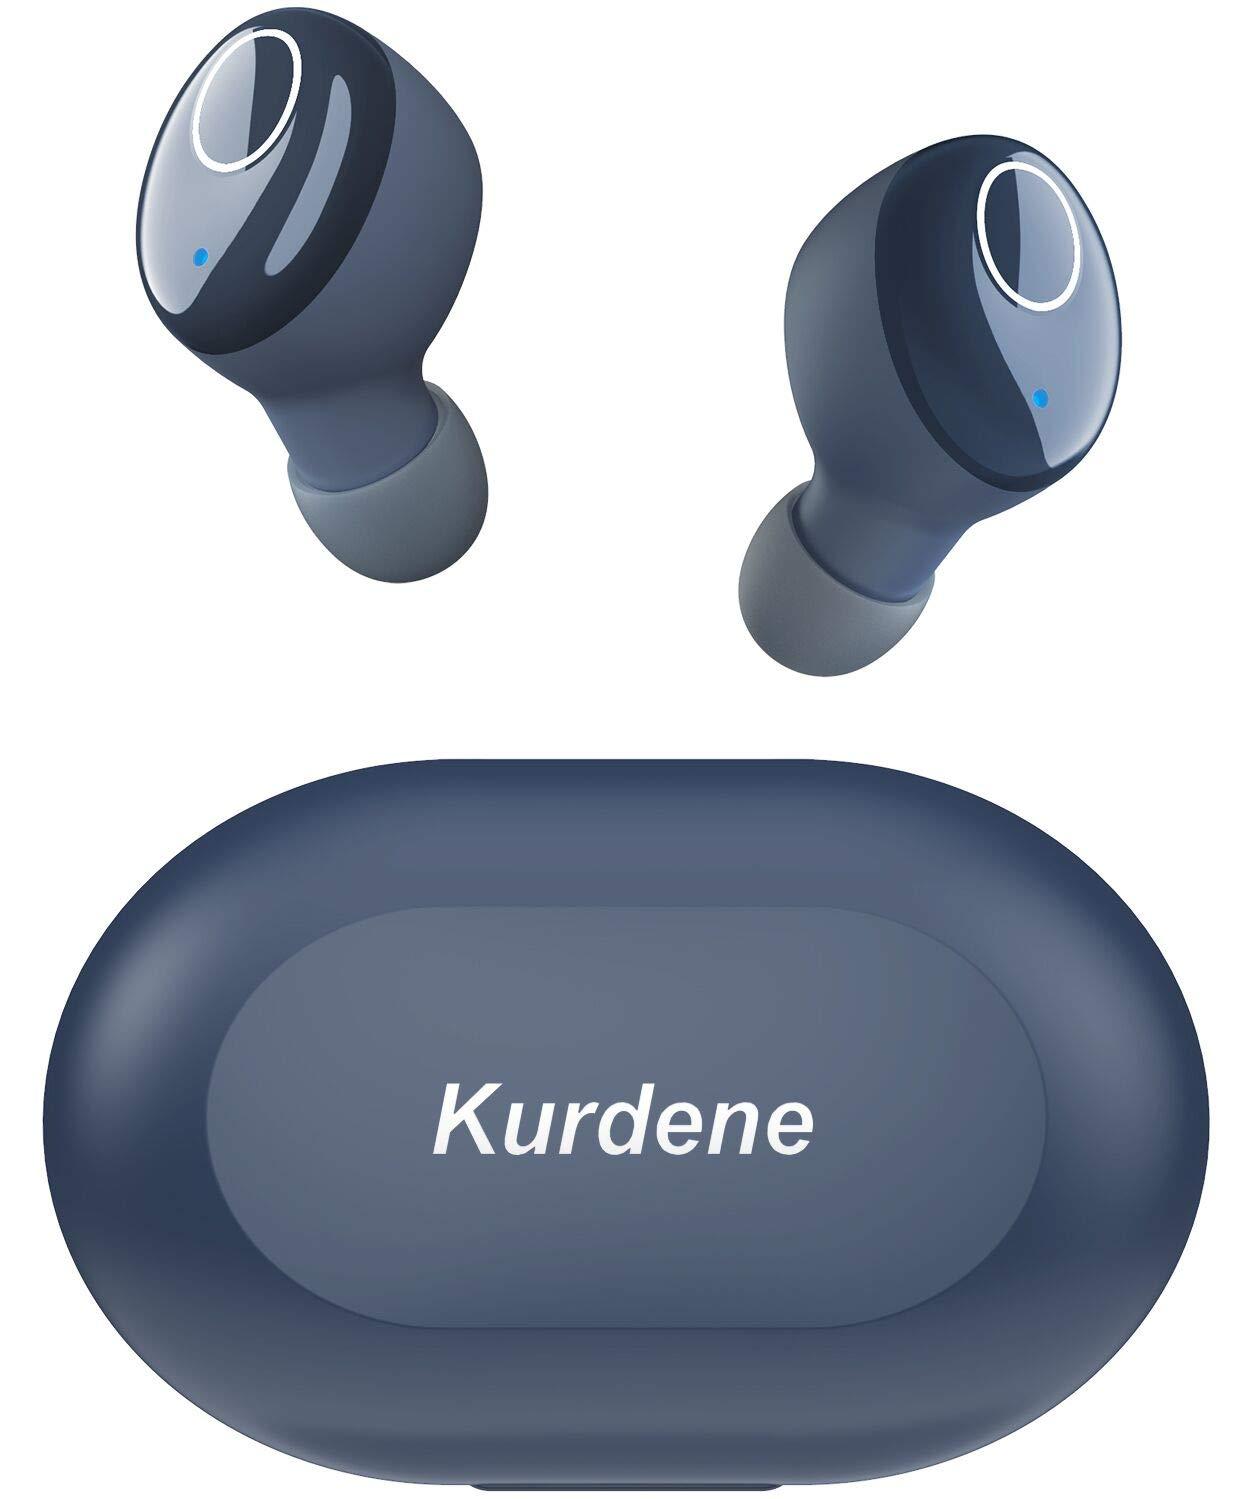 Auriculares Earbuds Inalambricos Kurdene Waterproof IPX8 Roy